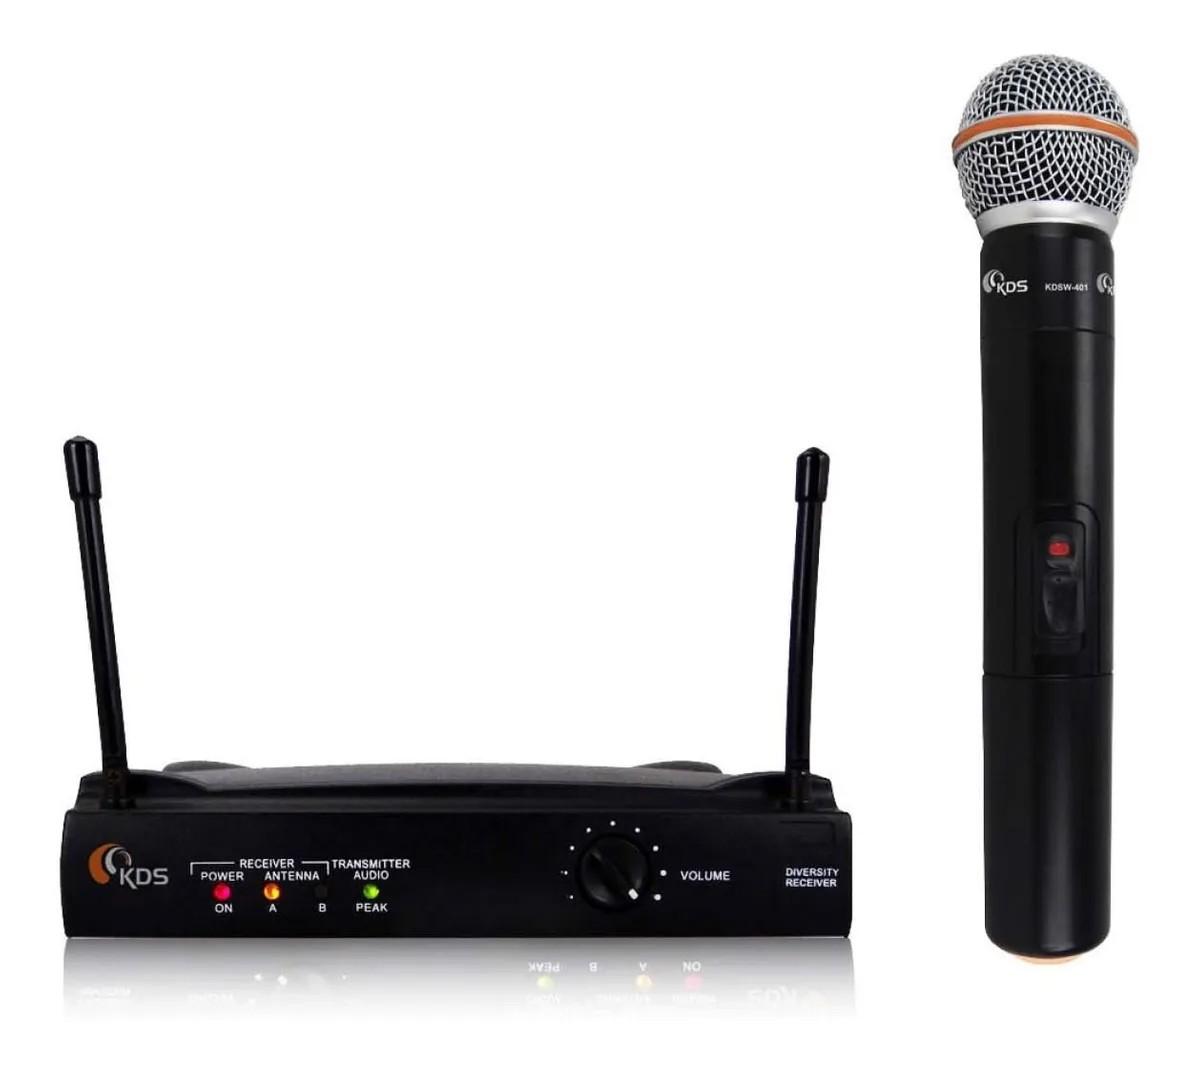 Microfone Kadosh Vocal Sem Fio Uhf K401M Kdsw  - MegaLojaSP